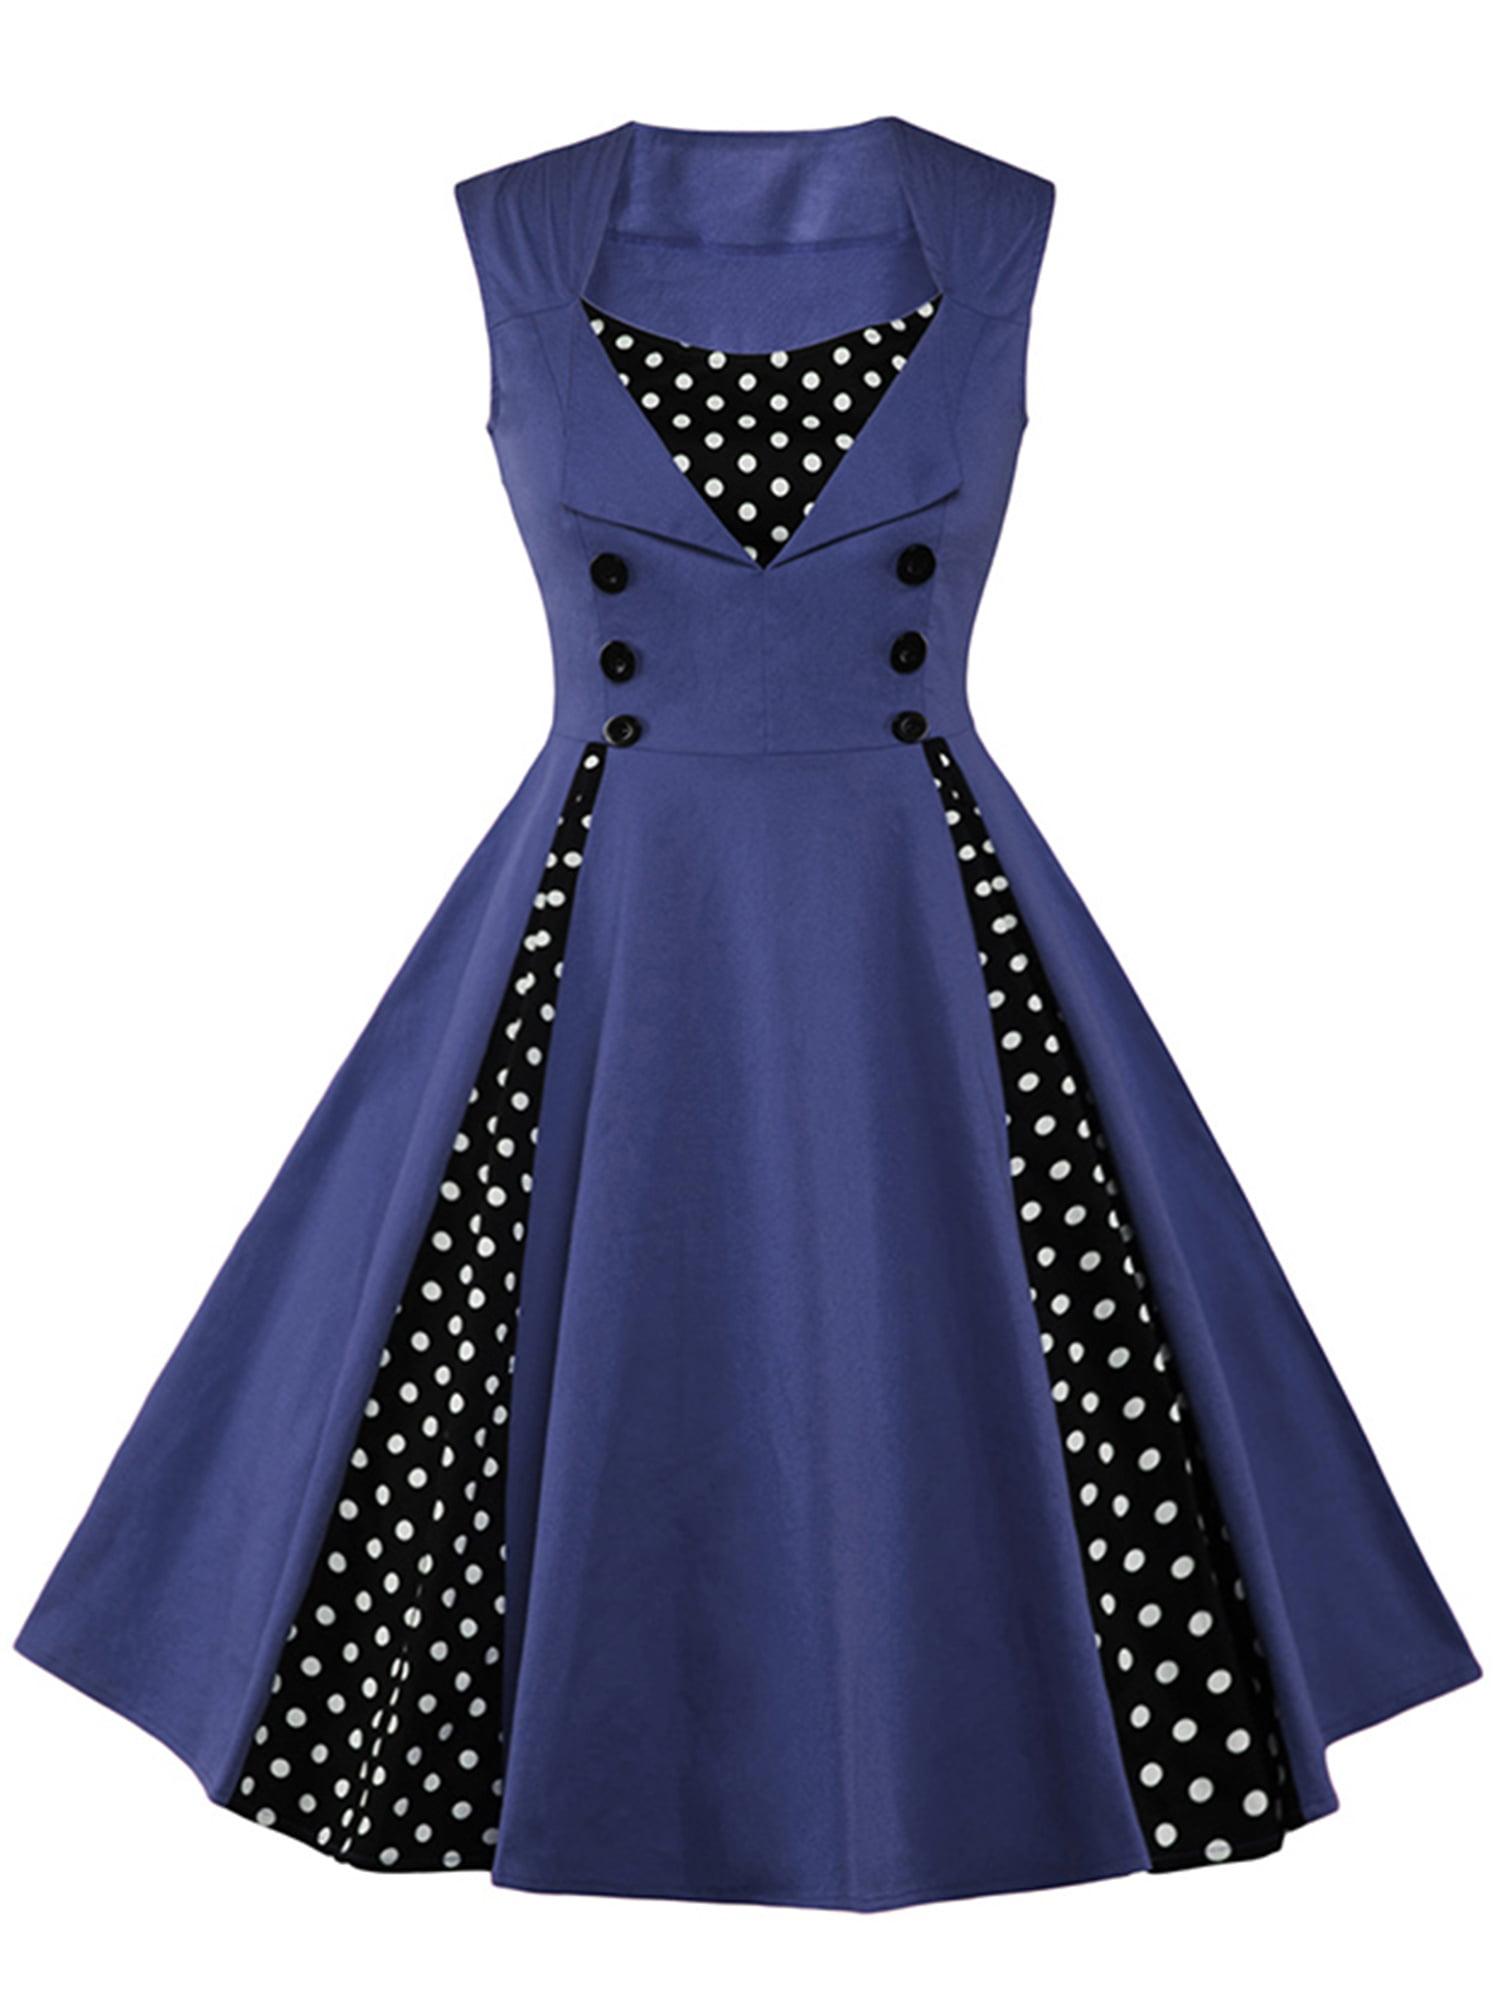 Womens Vintage 1950s Style Dress Swing Polka Dot Boat Neck Strappy Formal Cocktail Grown Dresses Transer